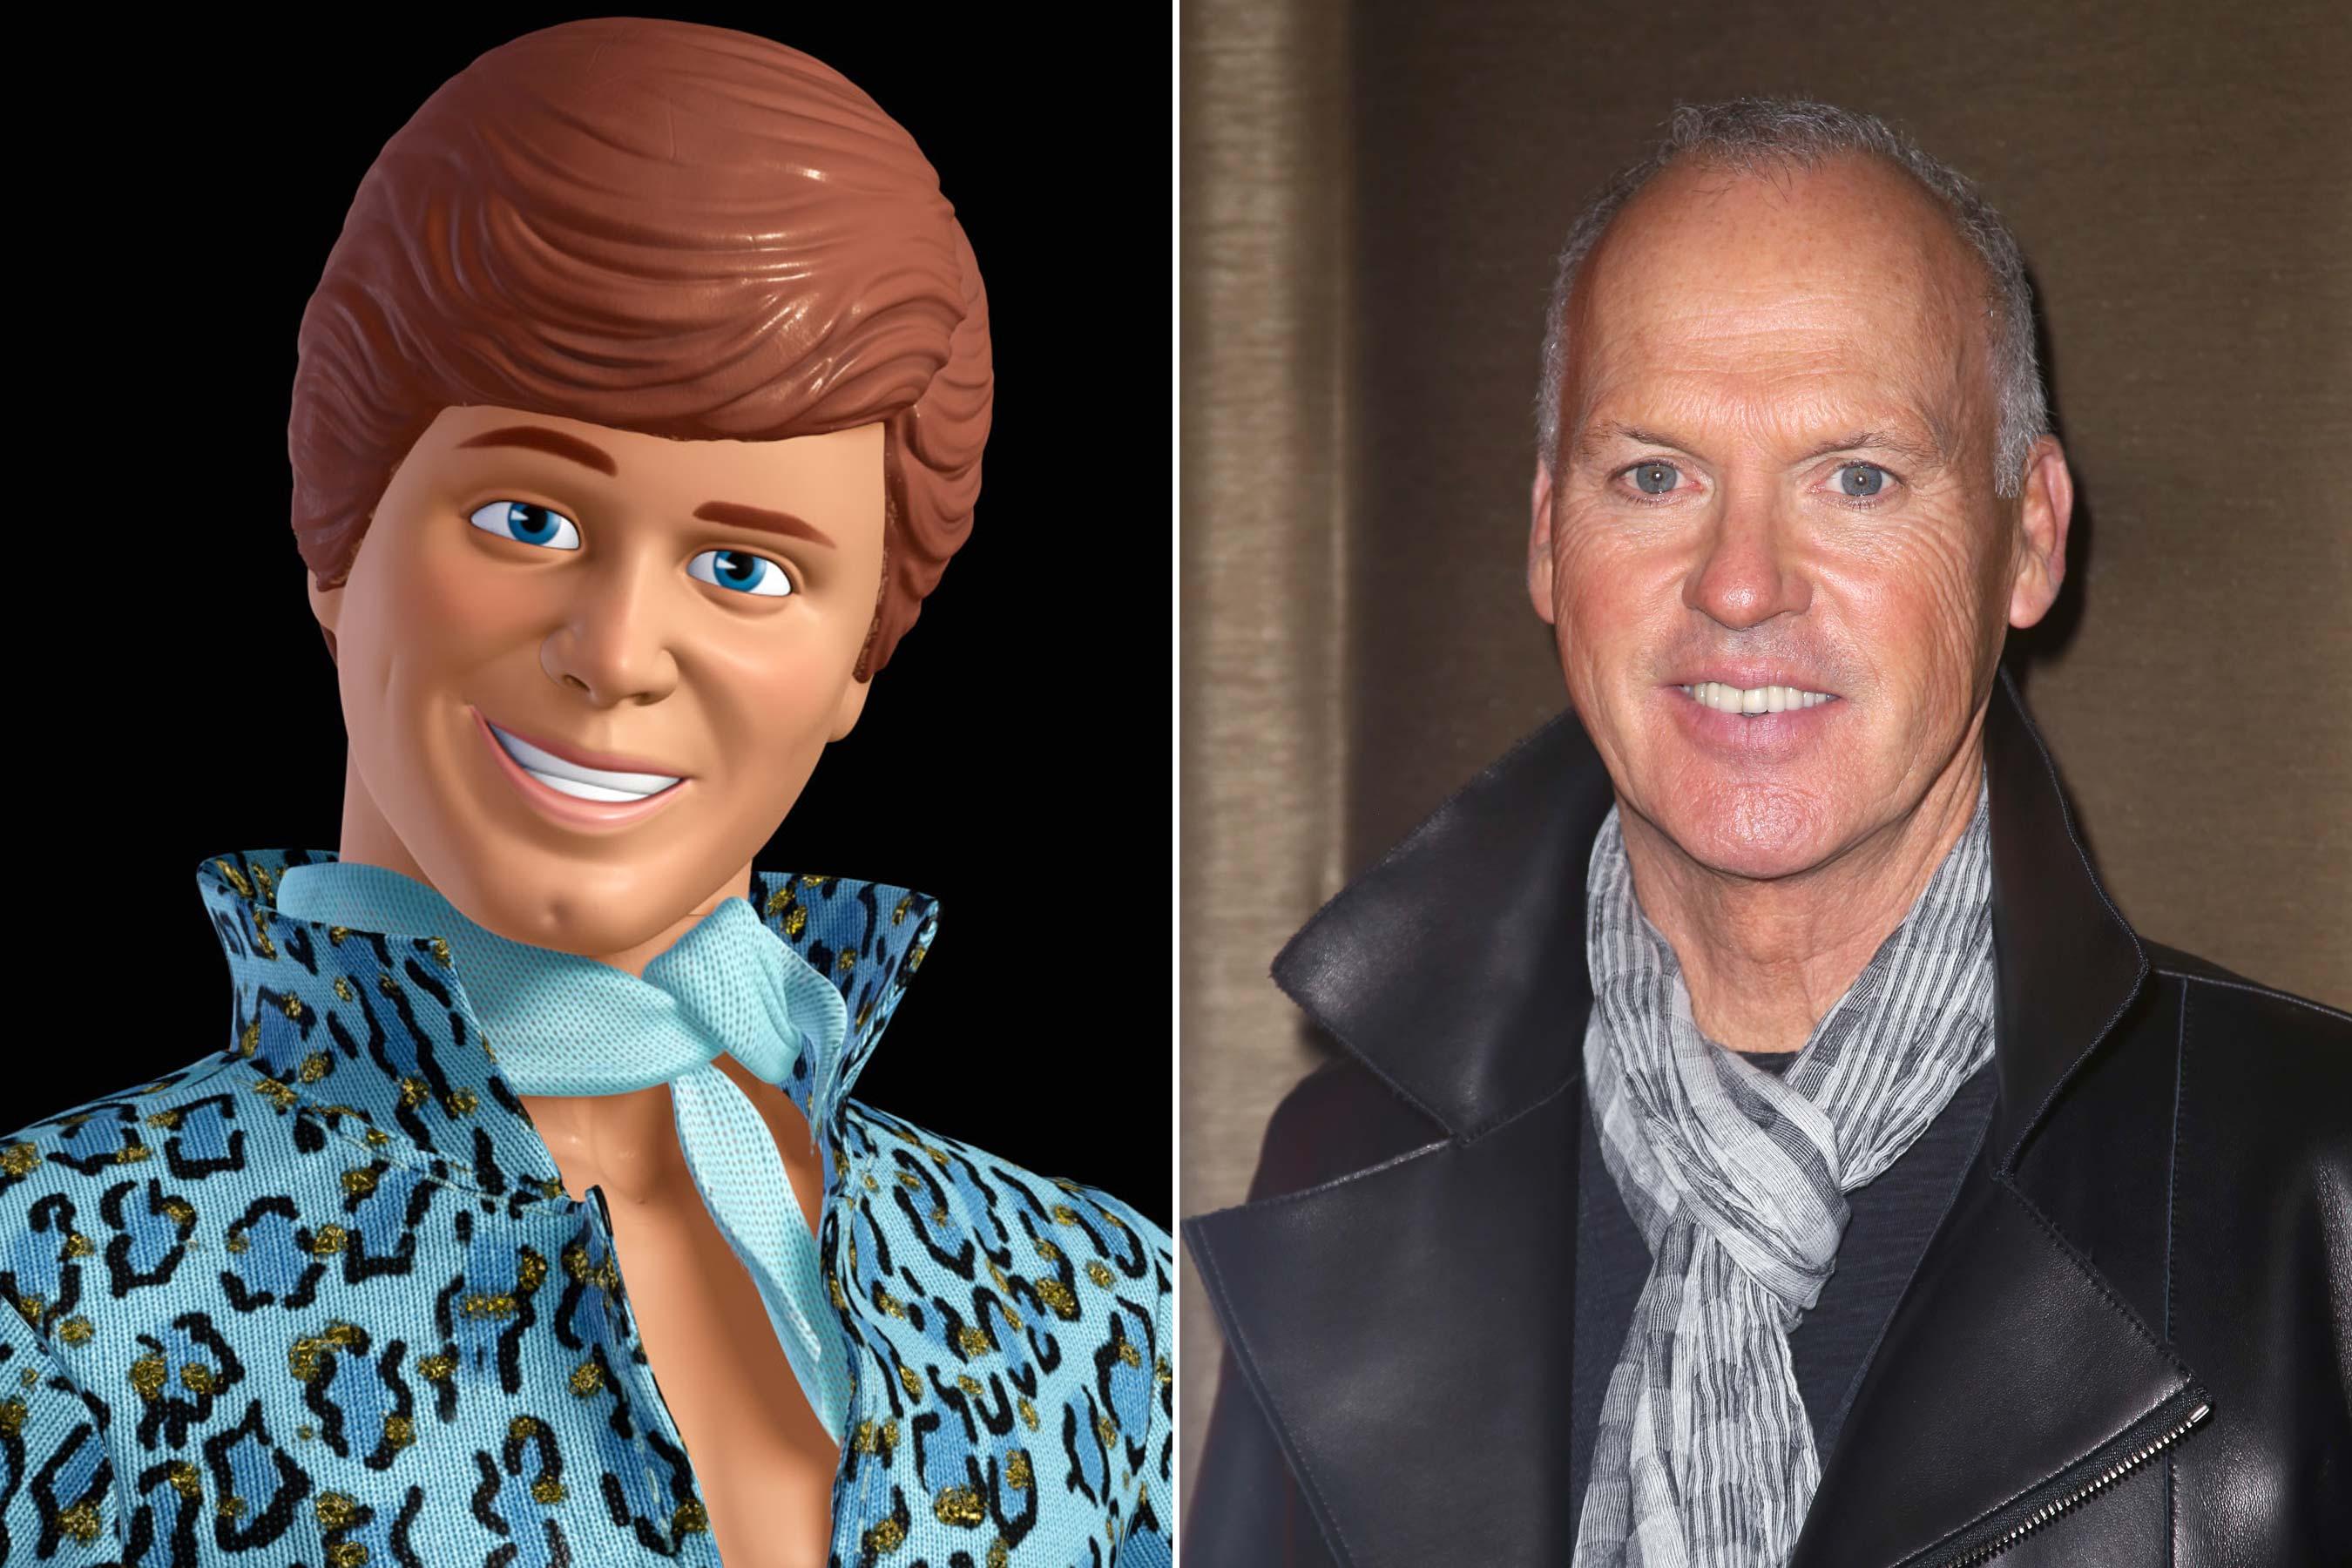 Ken - Michael Keaton (Toy Story 3)